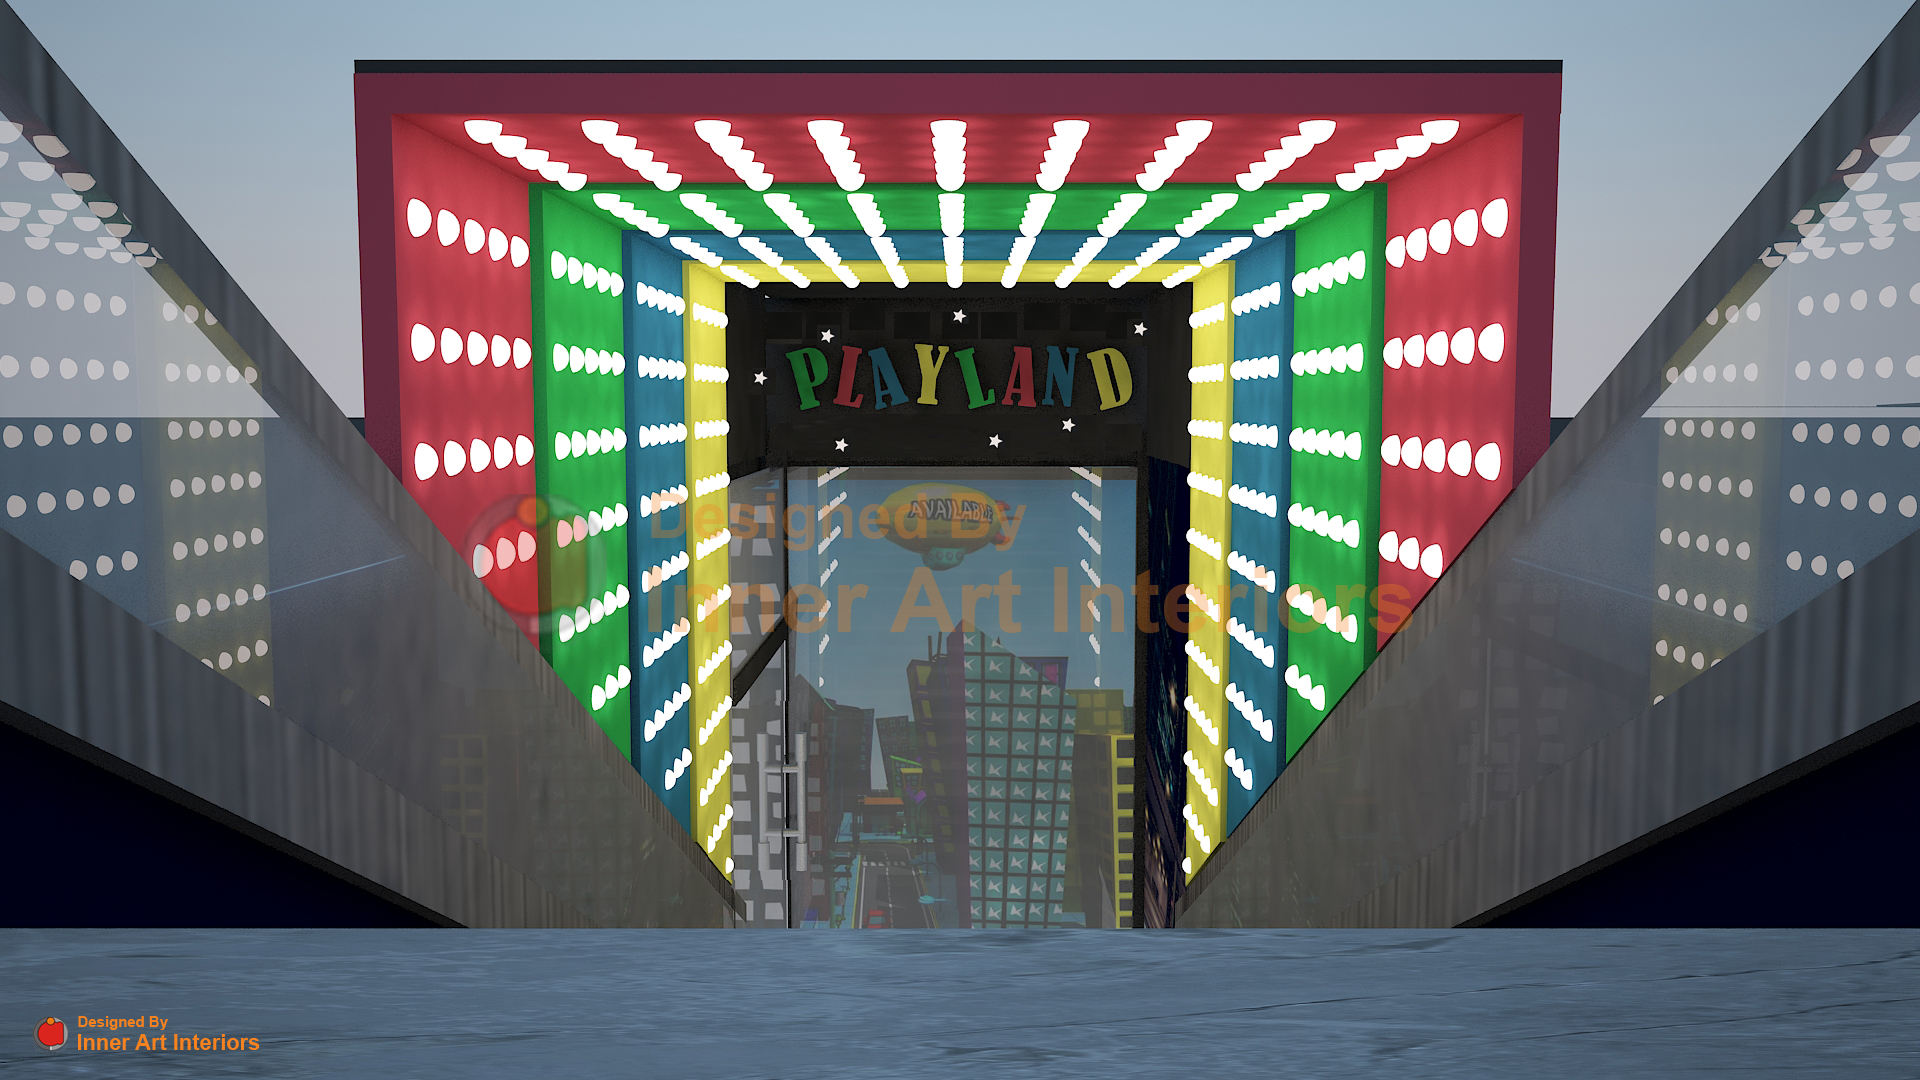 Playland Faisalabad